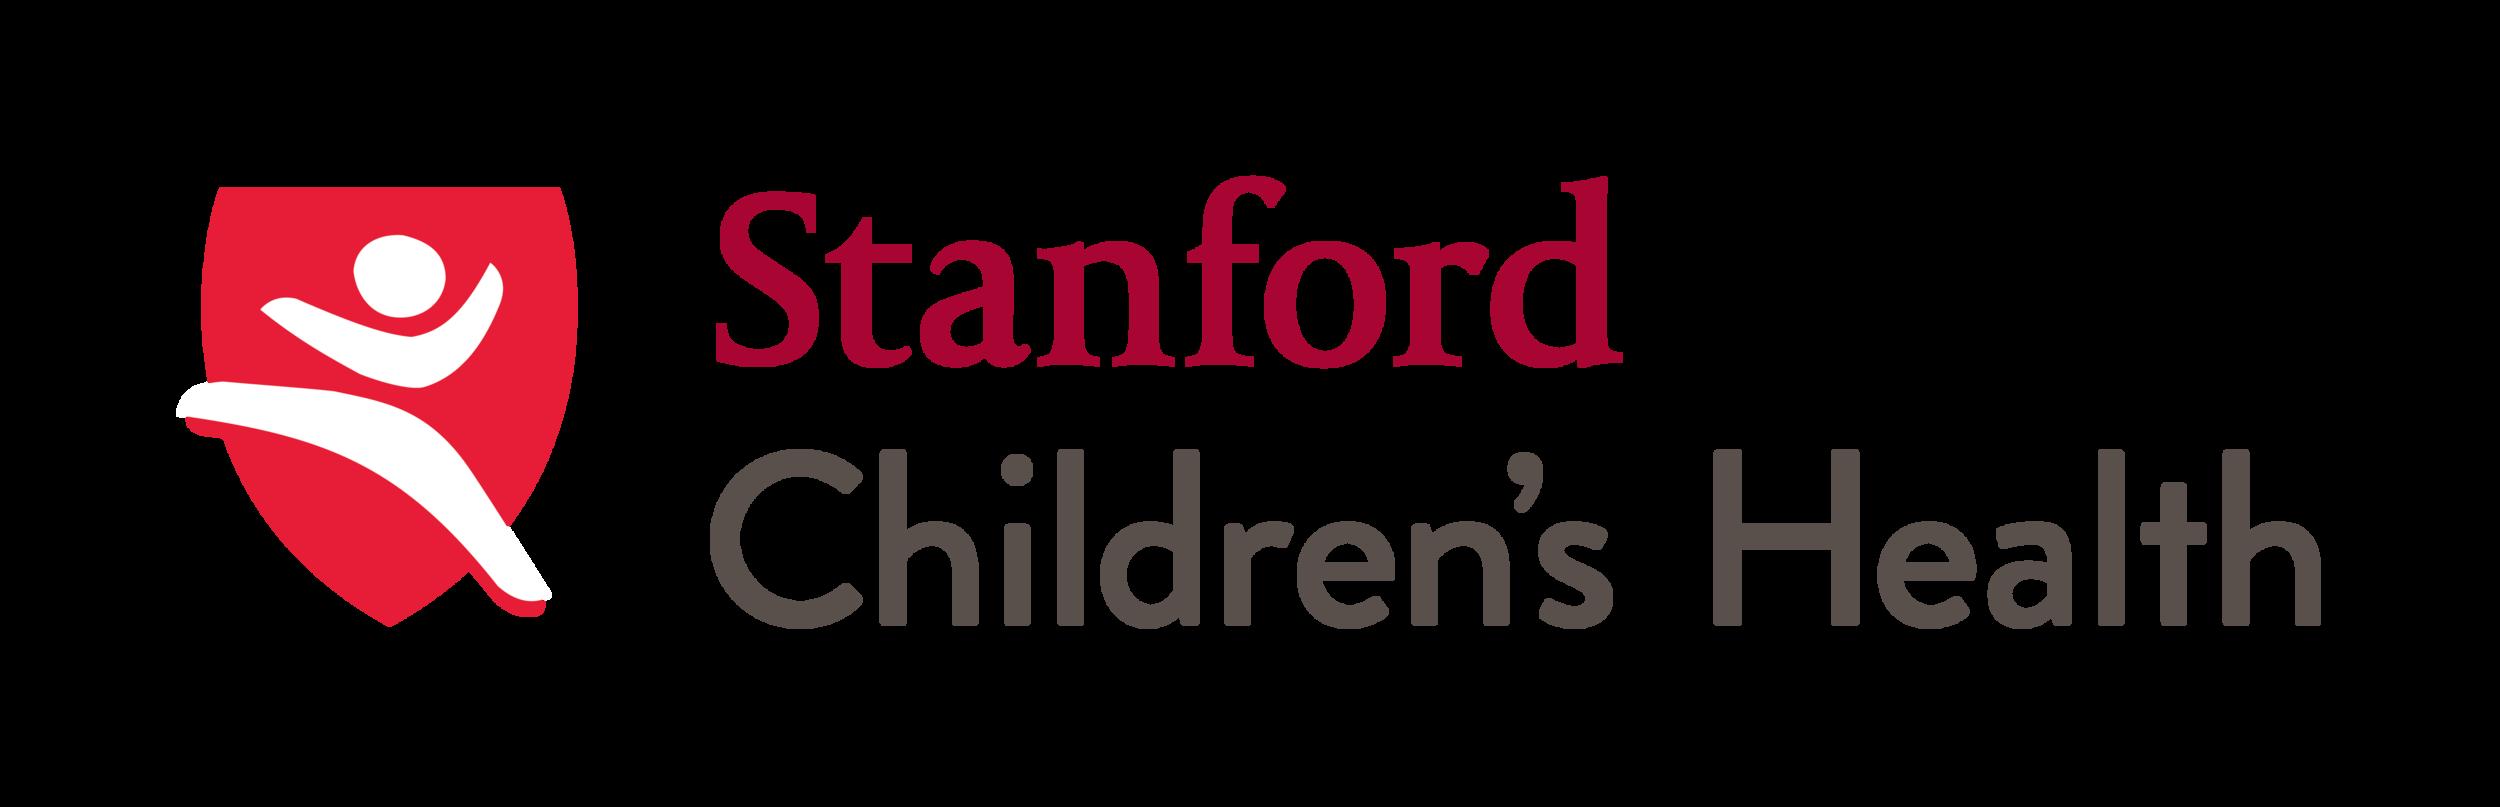 Stanford Children's hospital VR AR VRARA.png